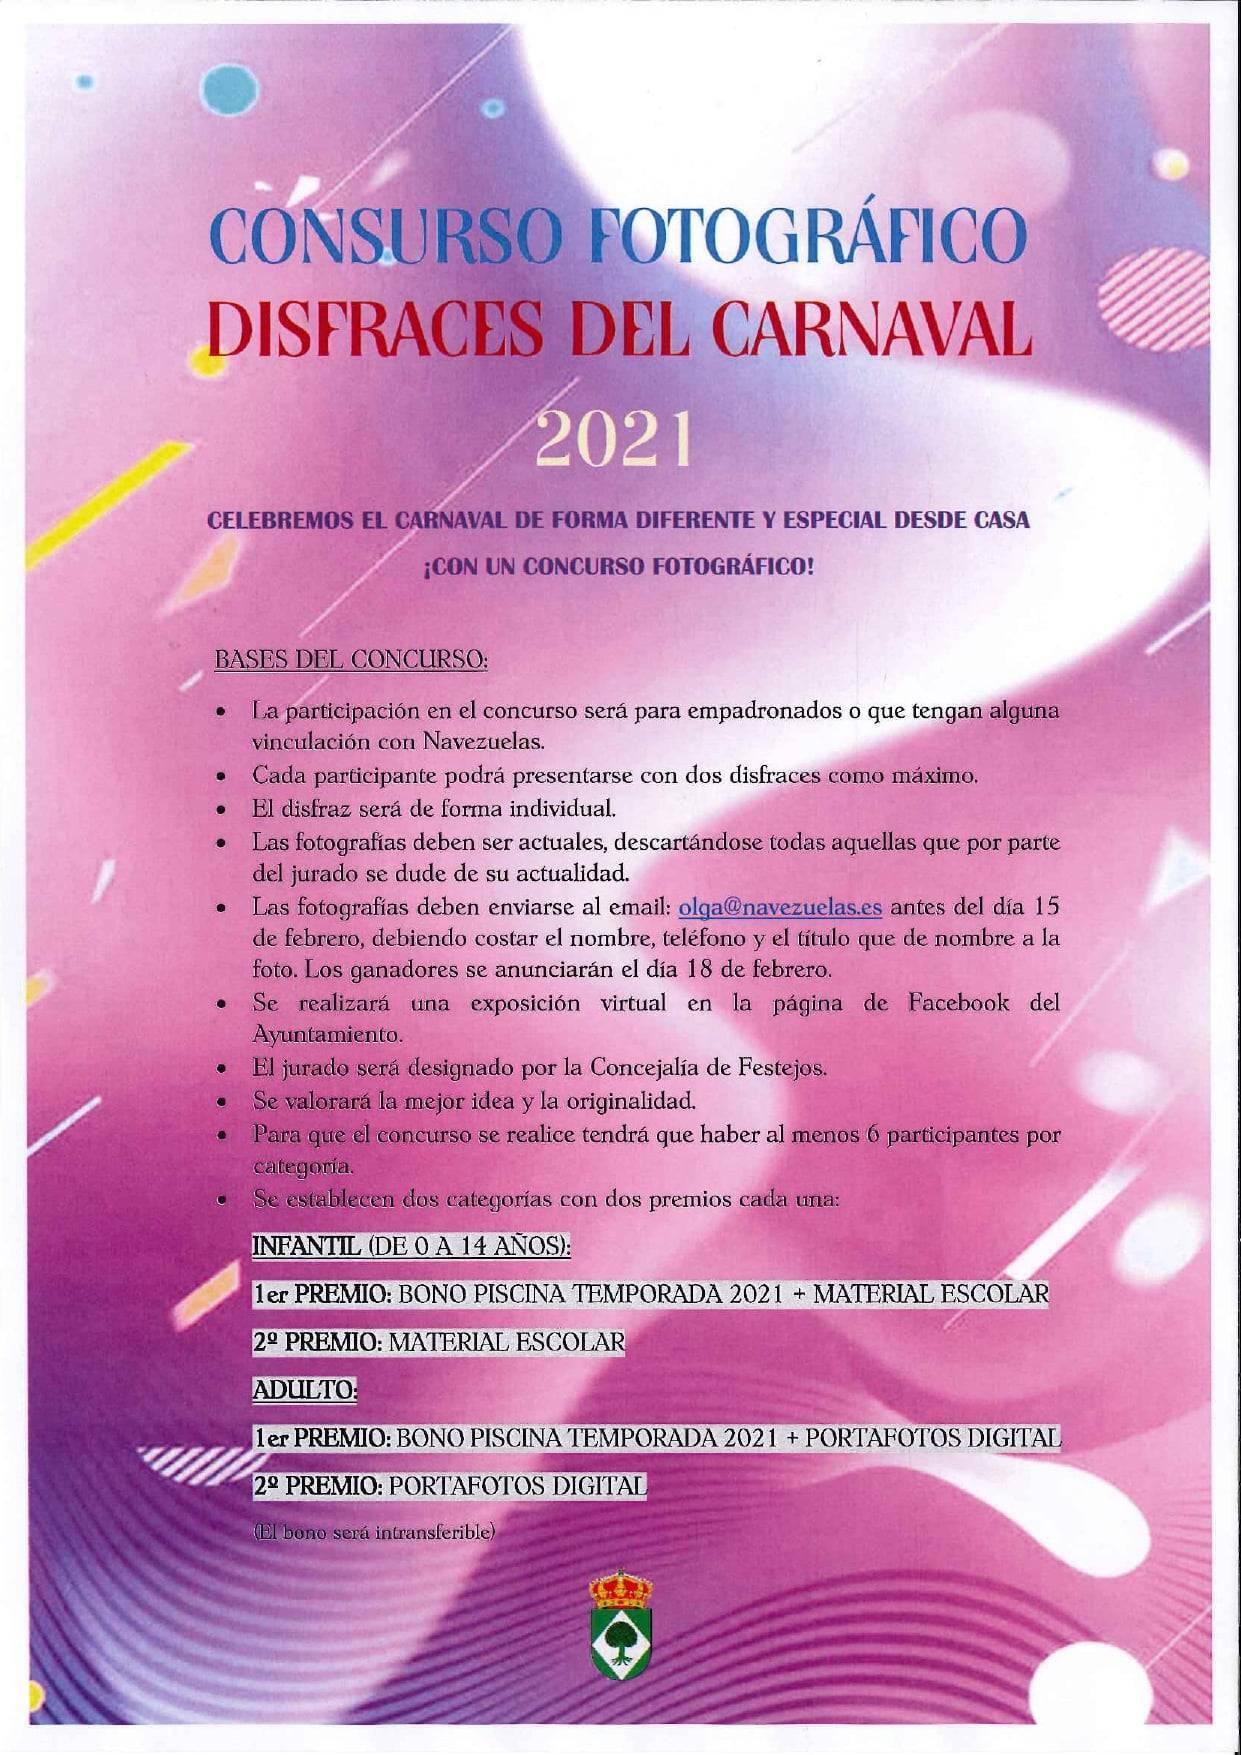 Concurso fotográfico de disfraces de carnaval (2021) - Navezuelas (Cáceres)